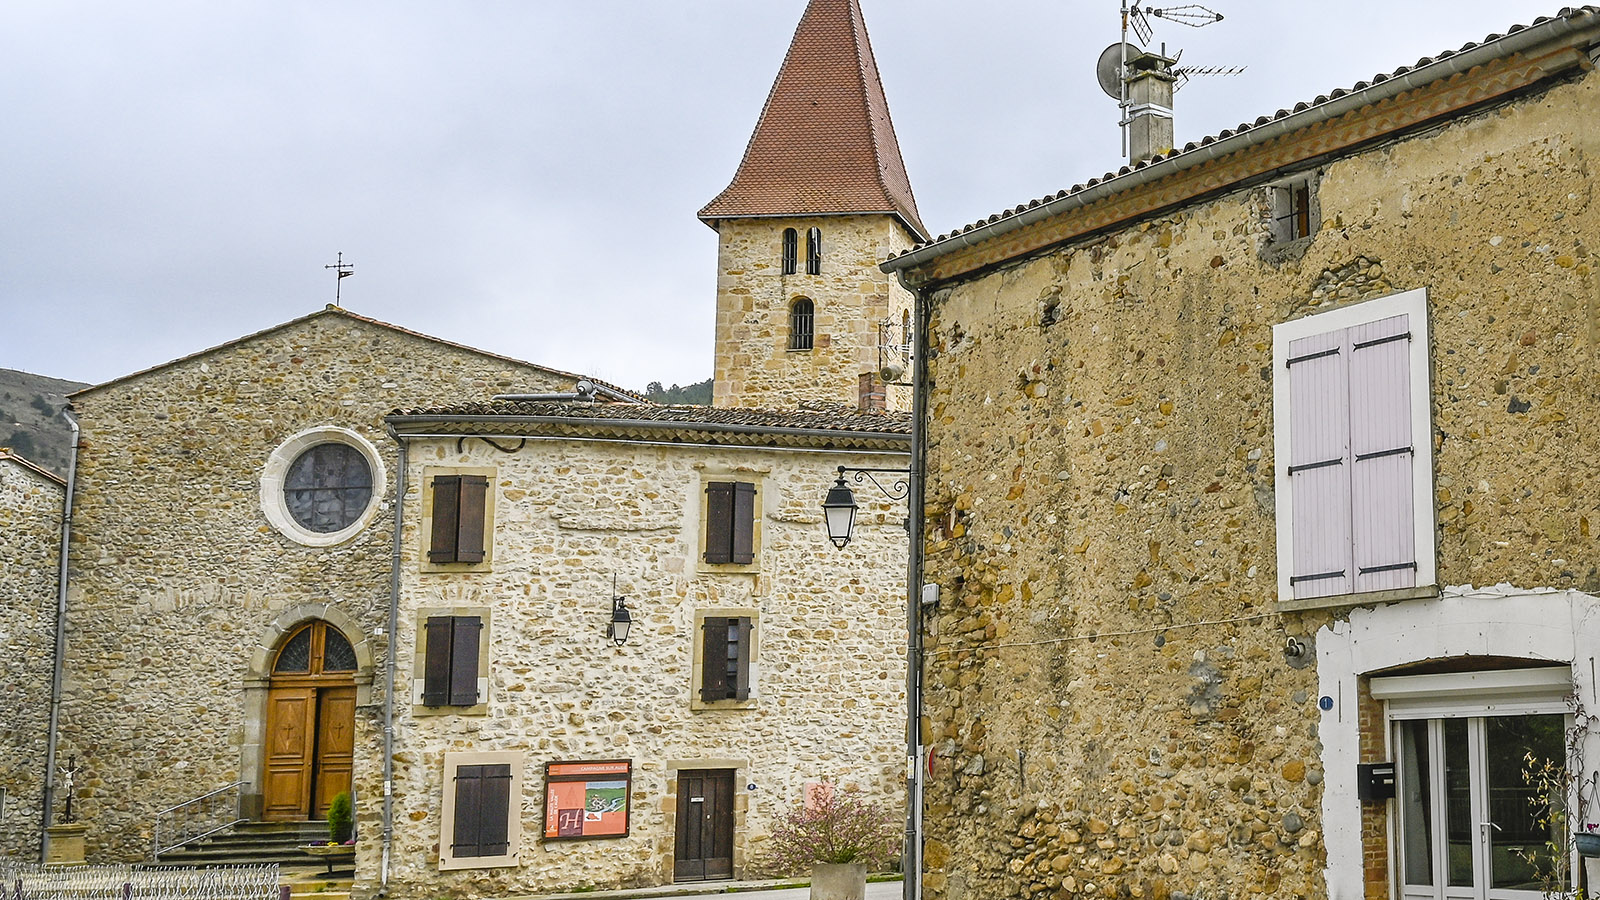 Campagne-sur-Aude: Die Église Saint-Sébastien mit der integrierten Kapelle der Templer. Foto: Hilke Maunder